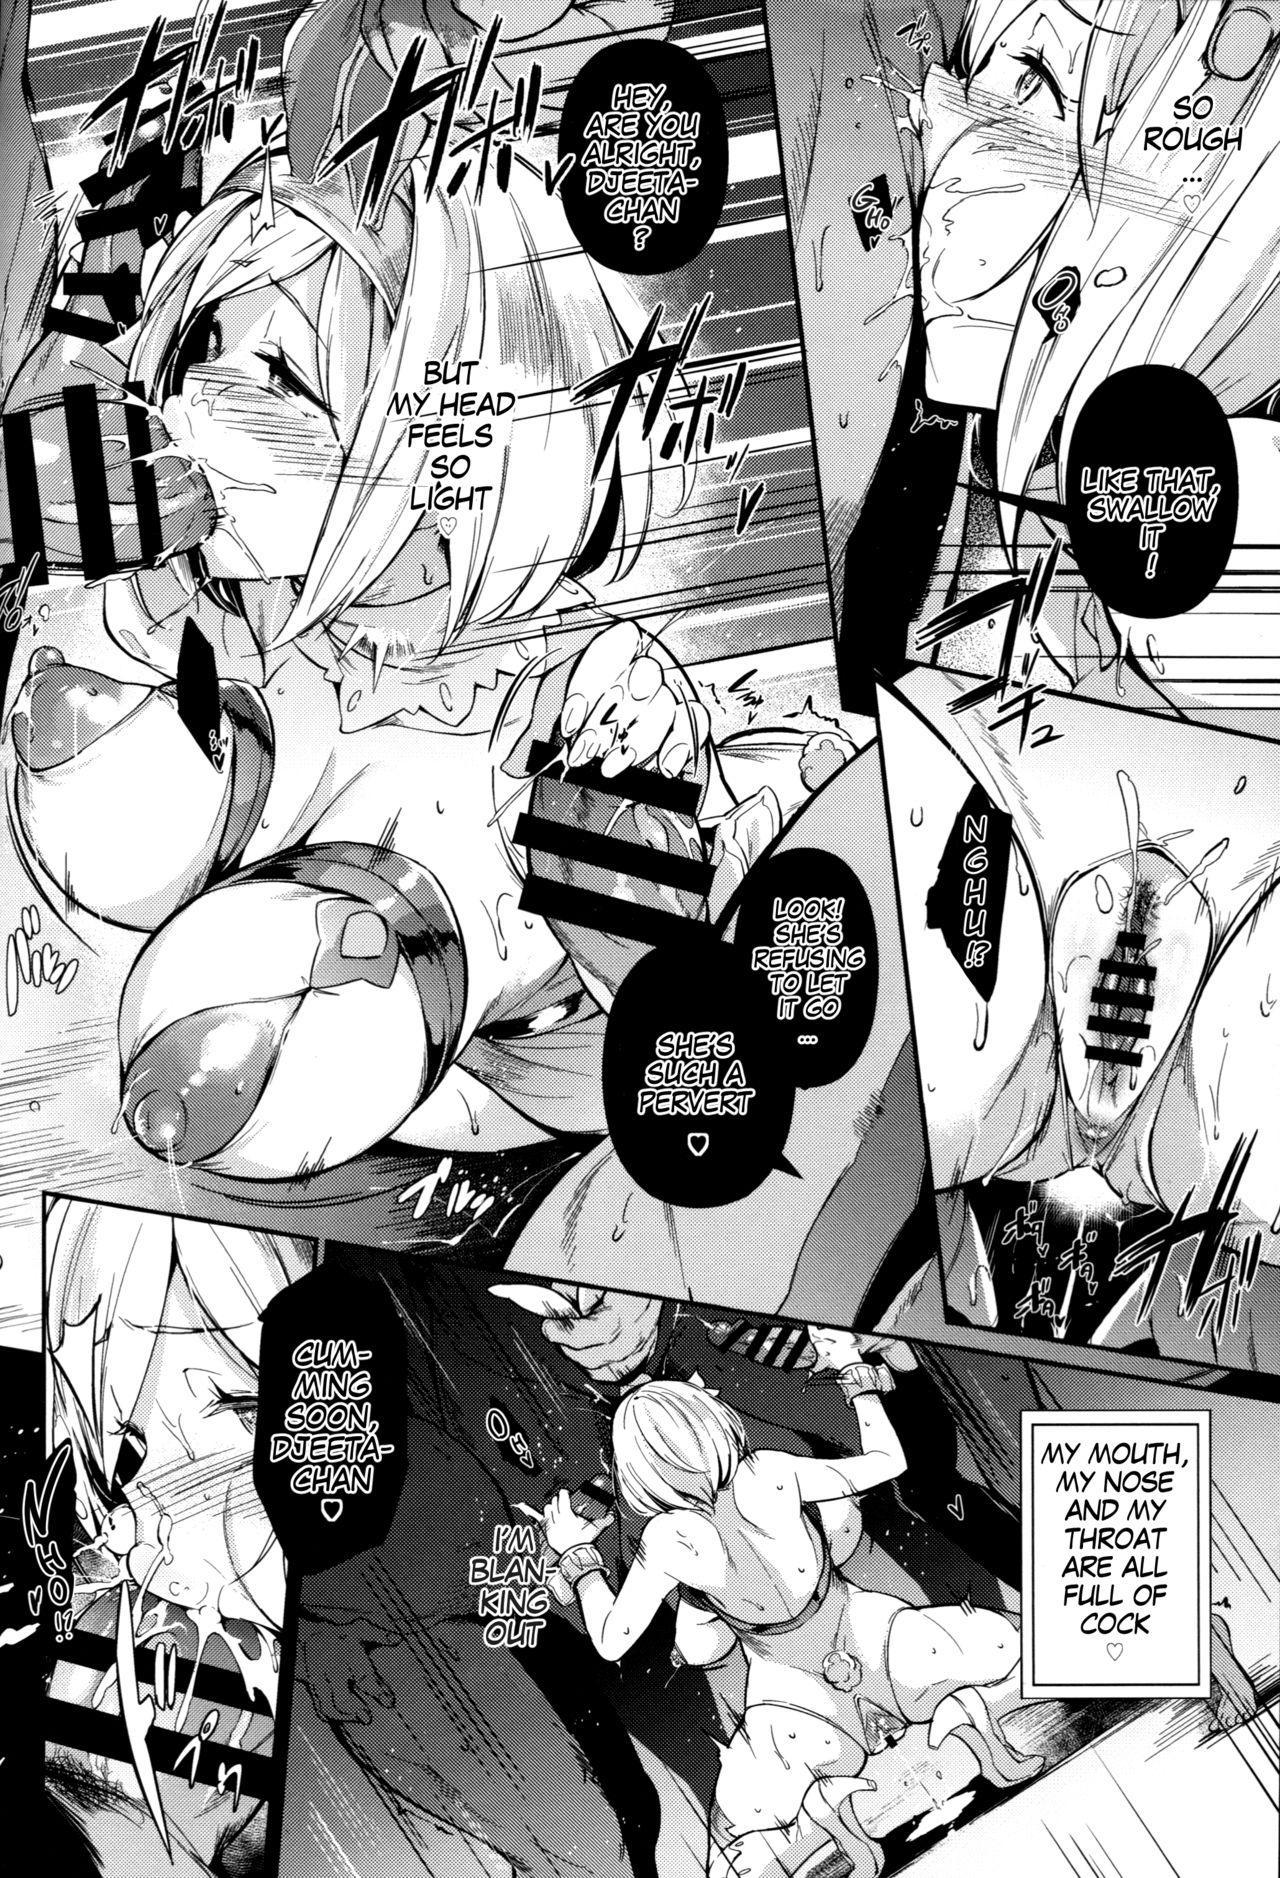 Gran Nyuu Fantasy Side G Shoujo D | Gran Boob Fantasy Side G Miss D 17